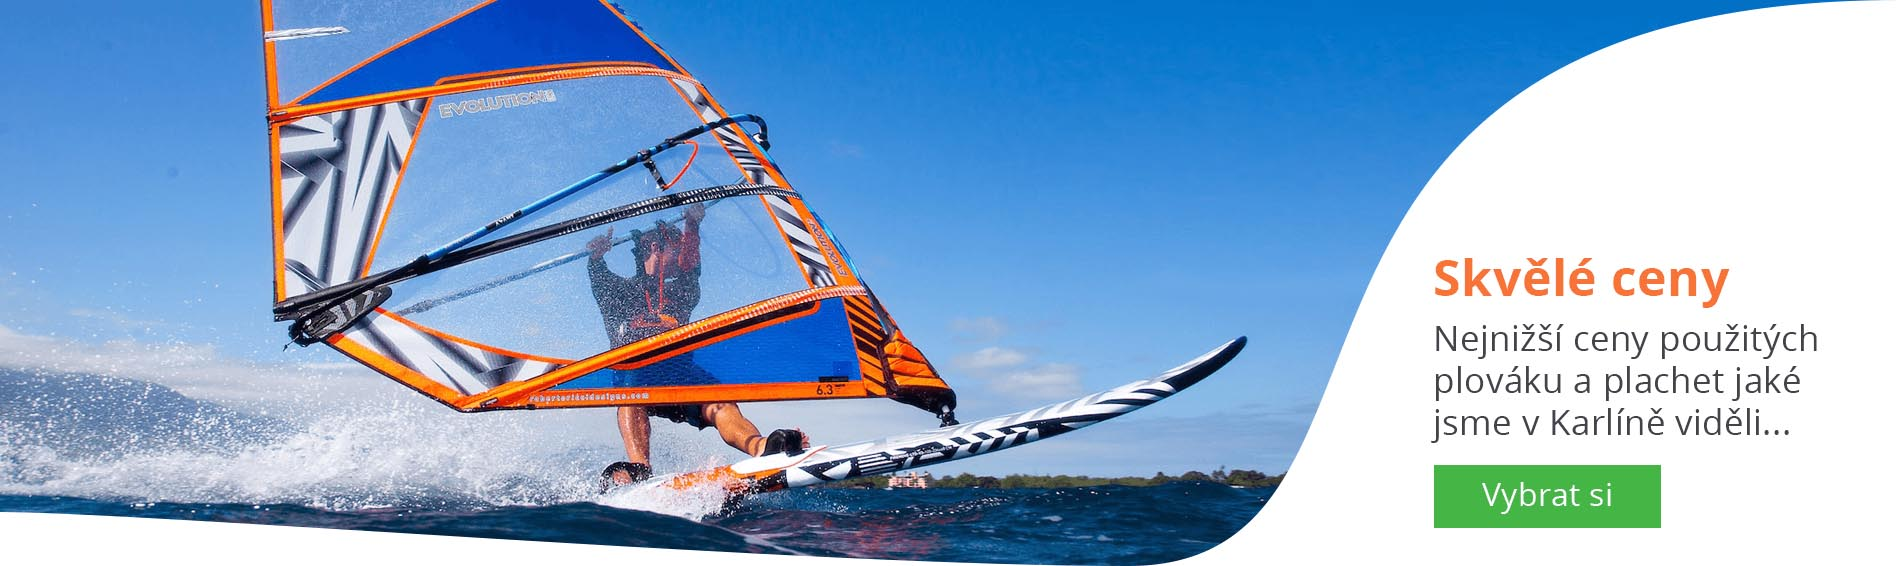 Bazar Windsurfing Karlín